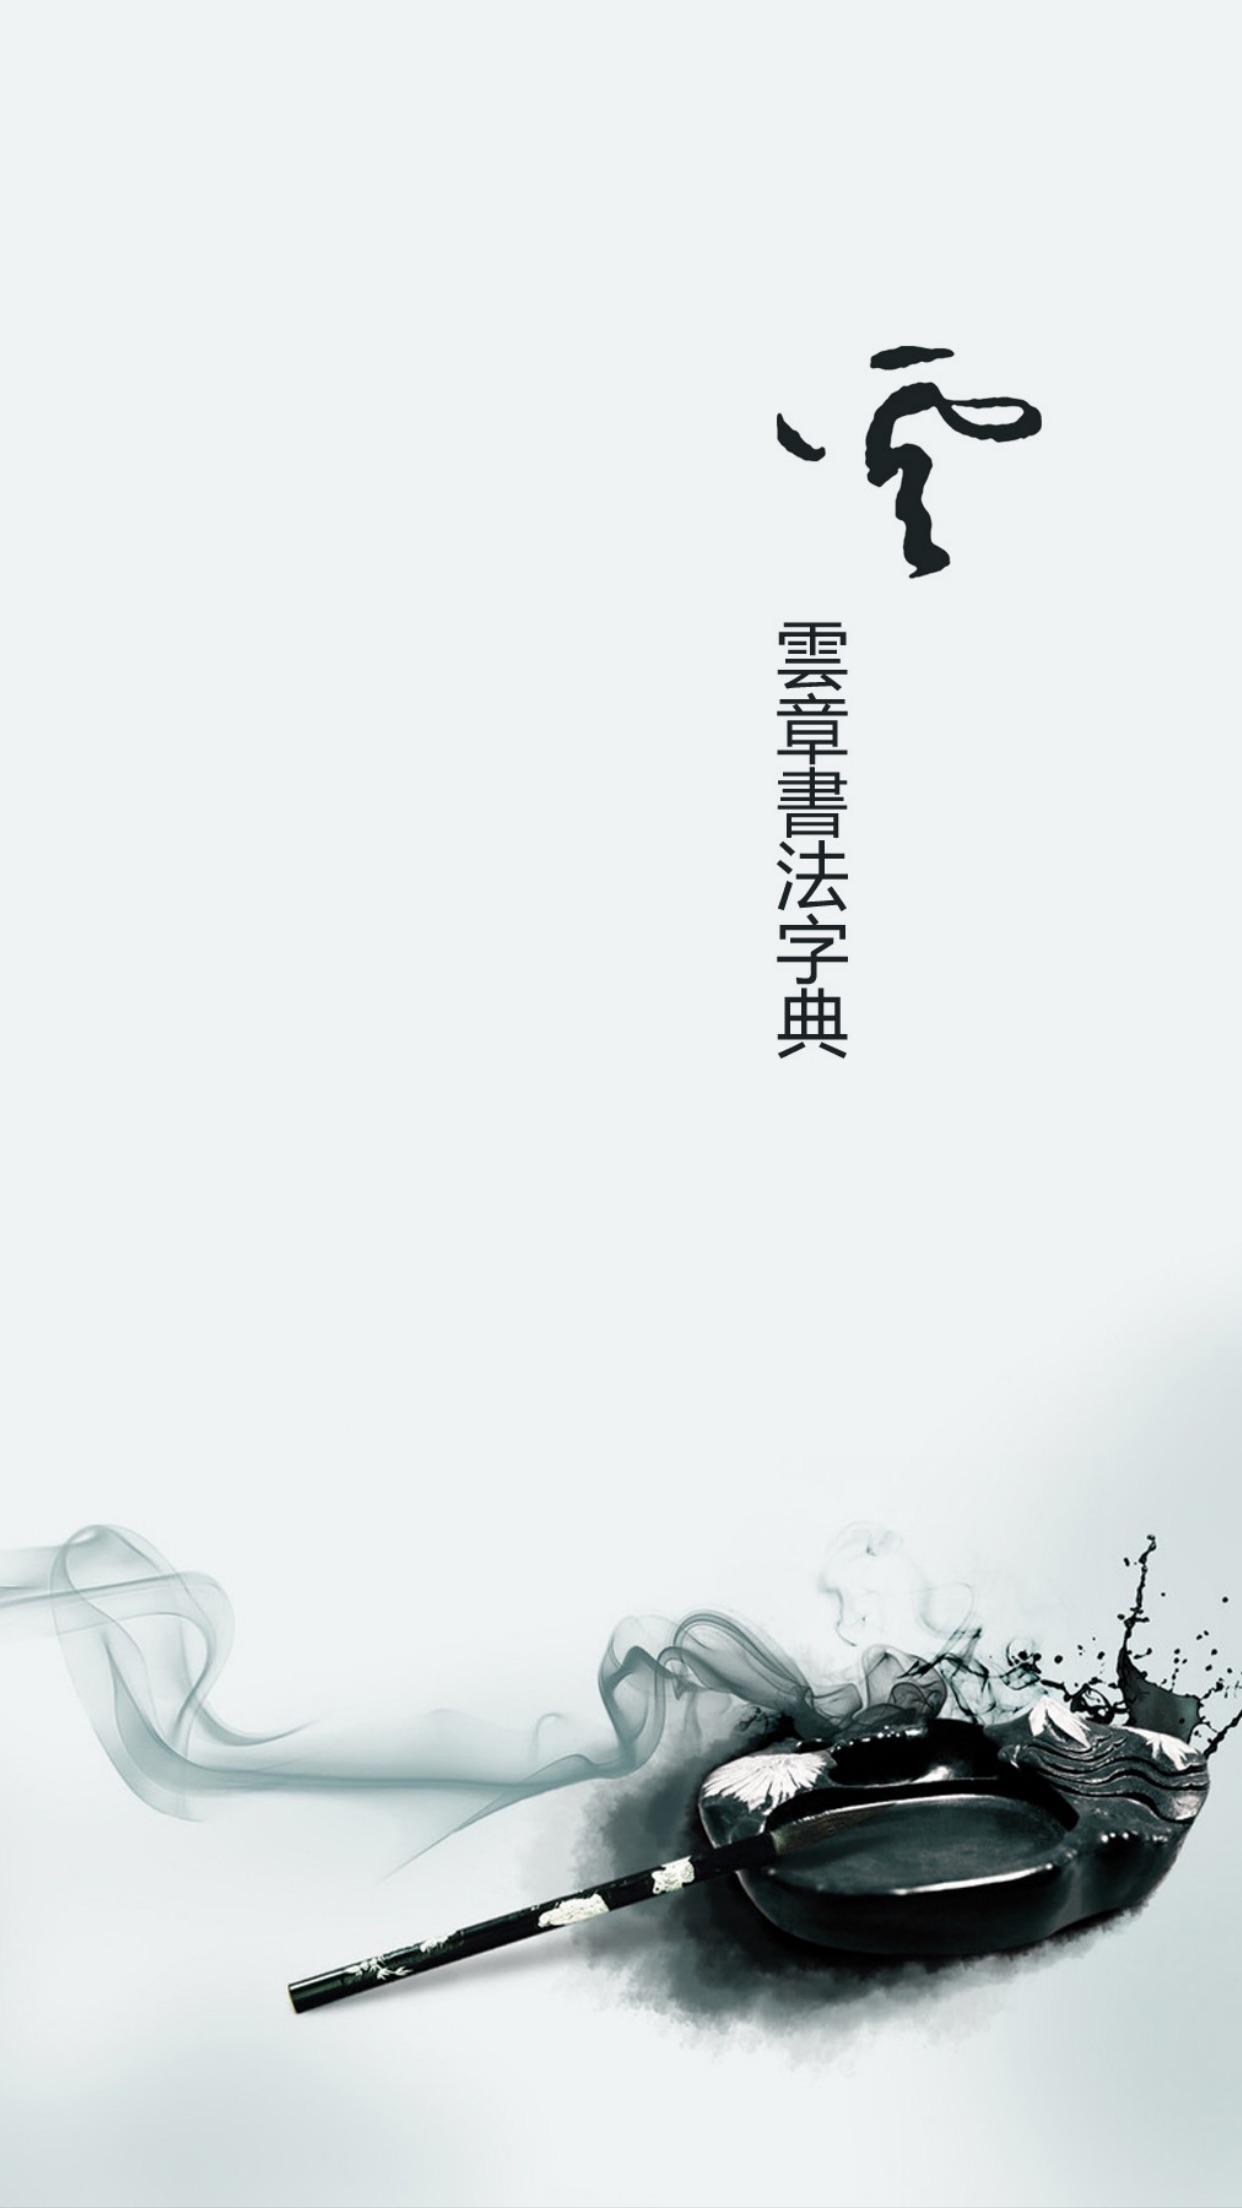 Yunzhang calligraphy | 云章书法字典 Screenshot